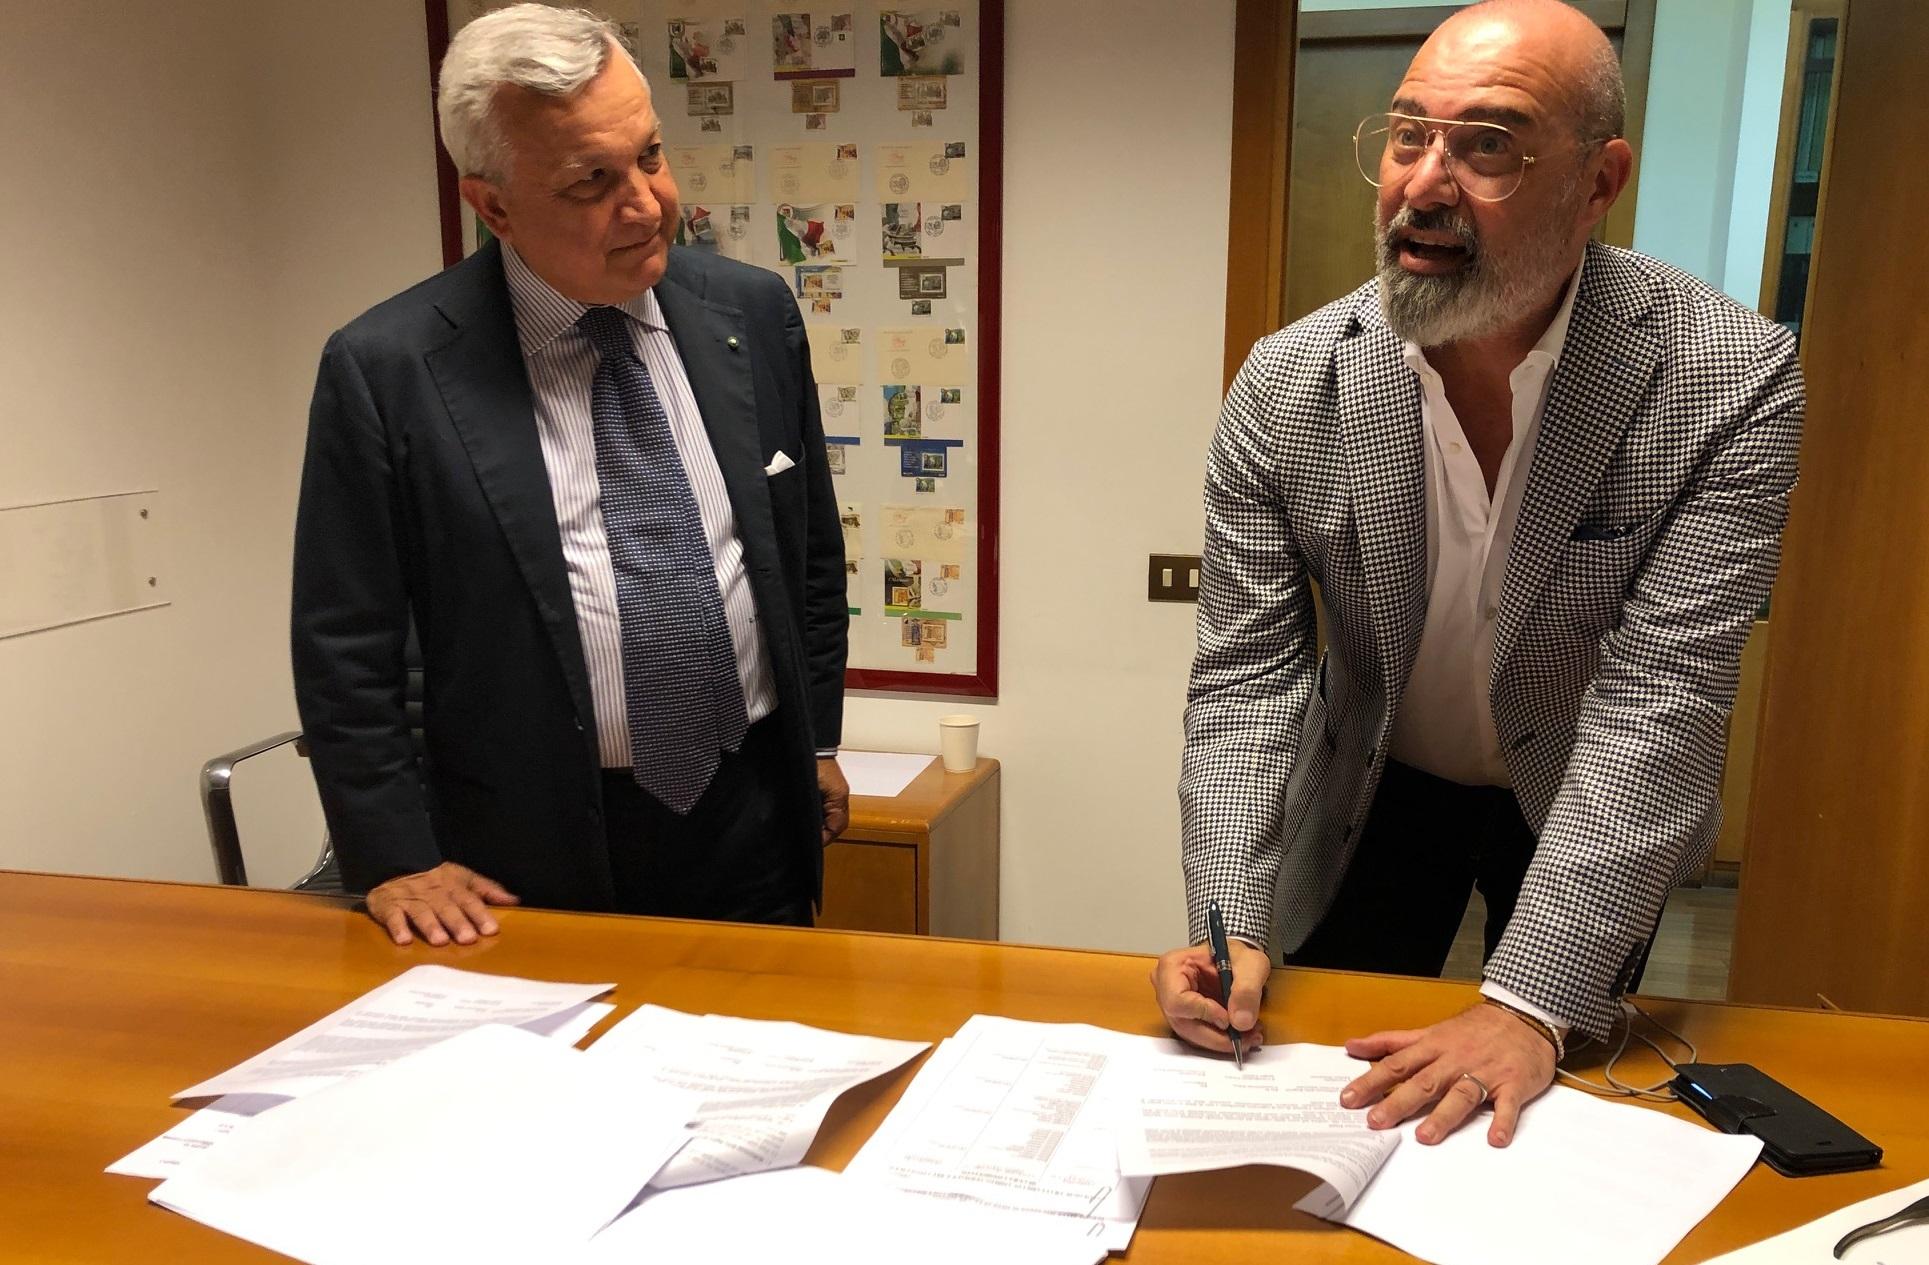 file/ELEMENTO_NEWSLETTER/20098/Jannotti-Pecci(federterme)con_Bonaccini_20190801.JPG